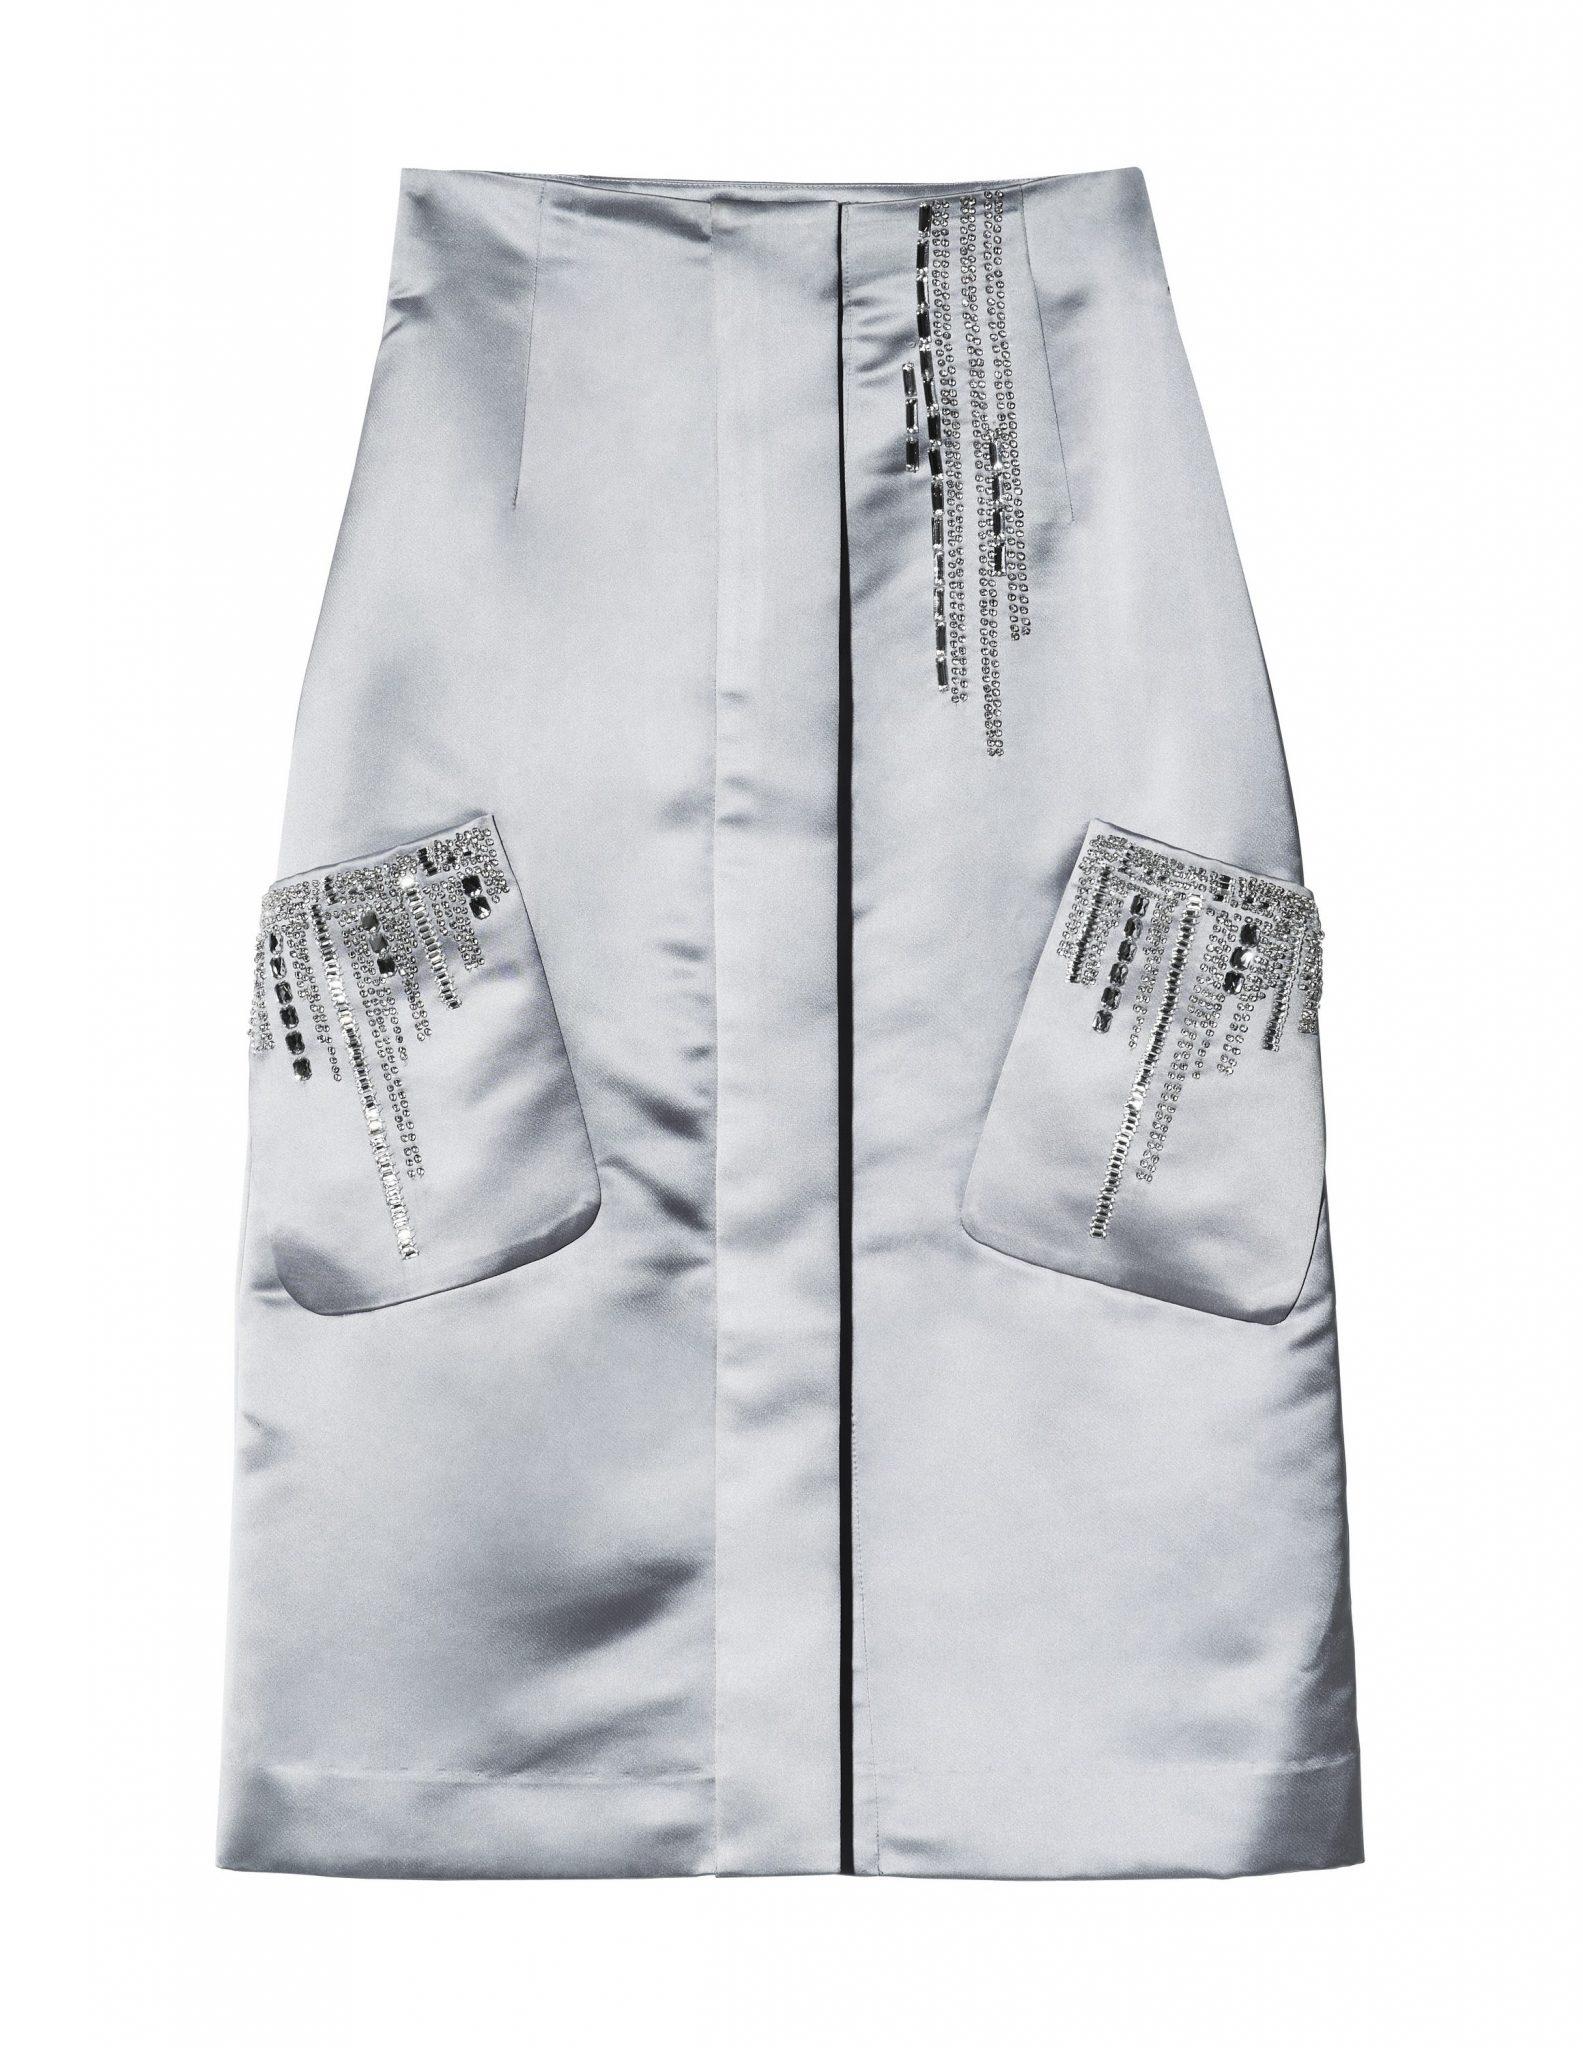 783490d4 H&M - sklep, wyprzedaże, kolekcja męska, damska, buty, spódnice